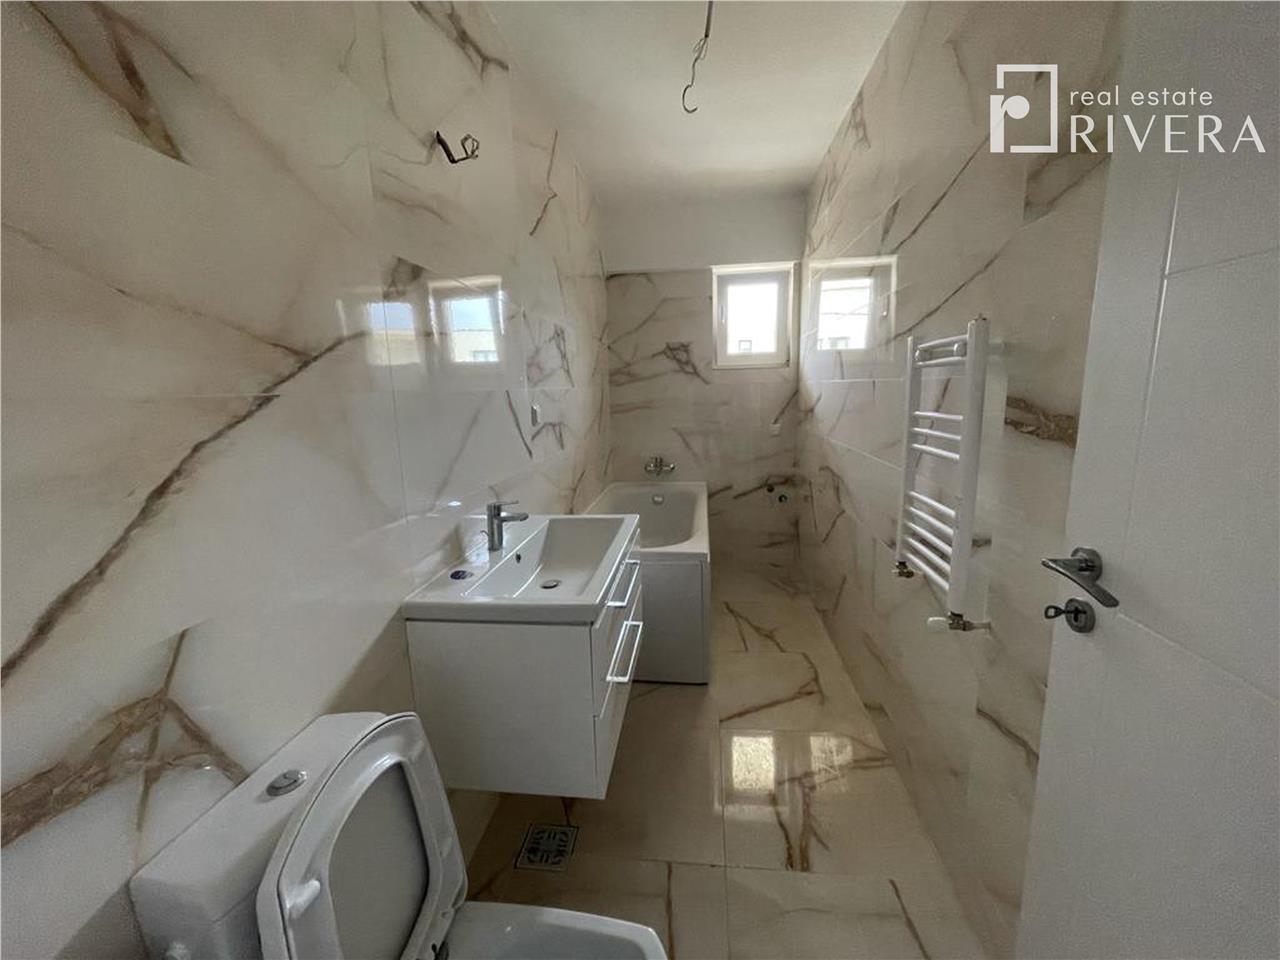 Apartament 2 camere | Cug | Etaj intermediar